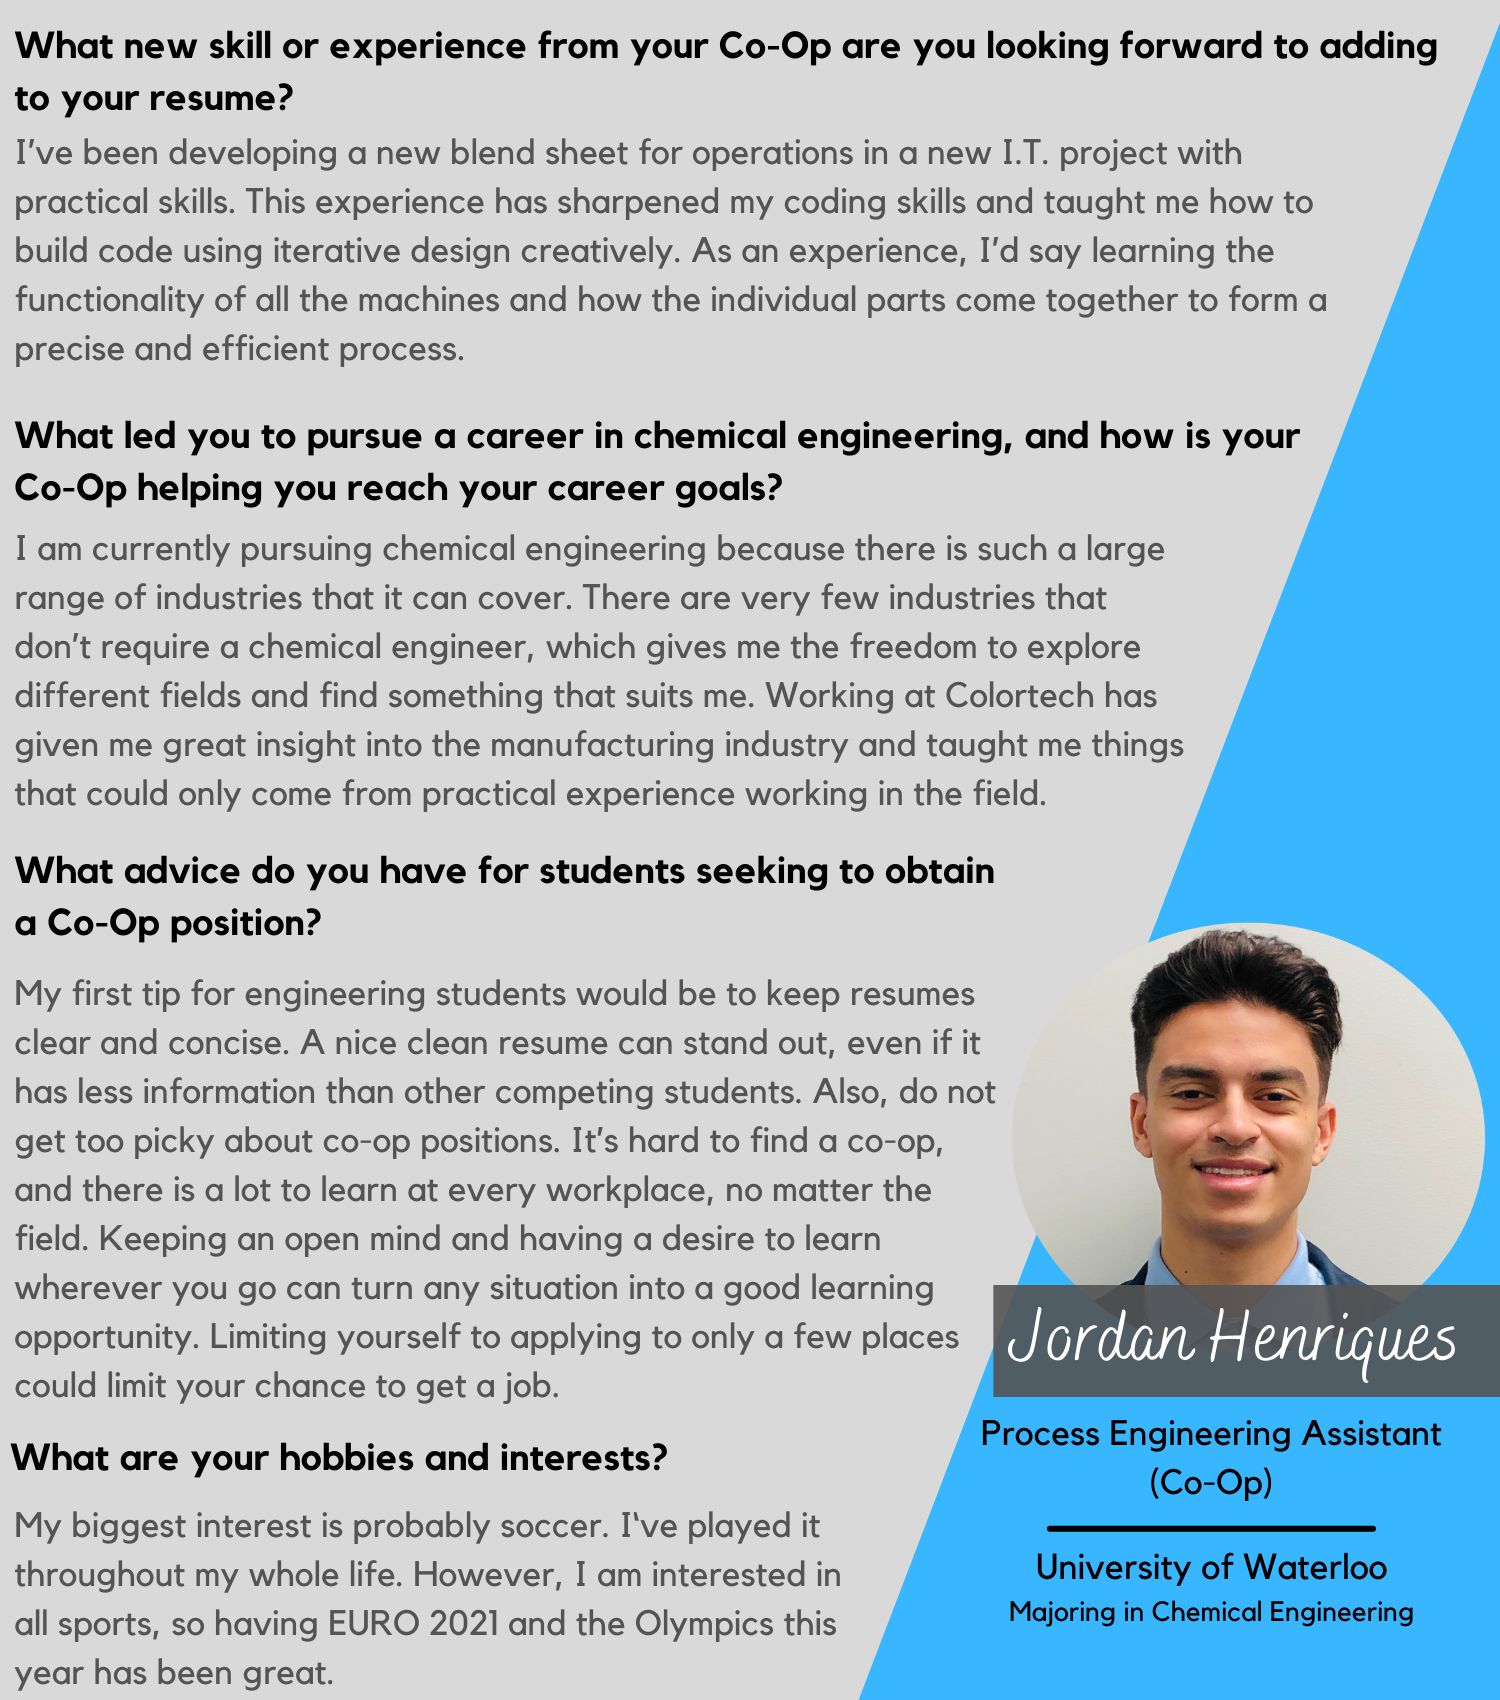 Jordan Henriques, Process Engineering Assistant